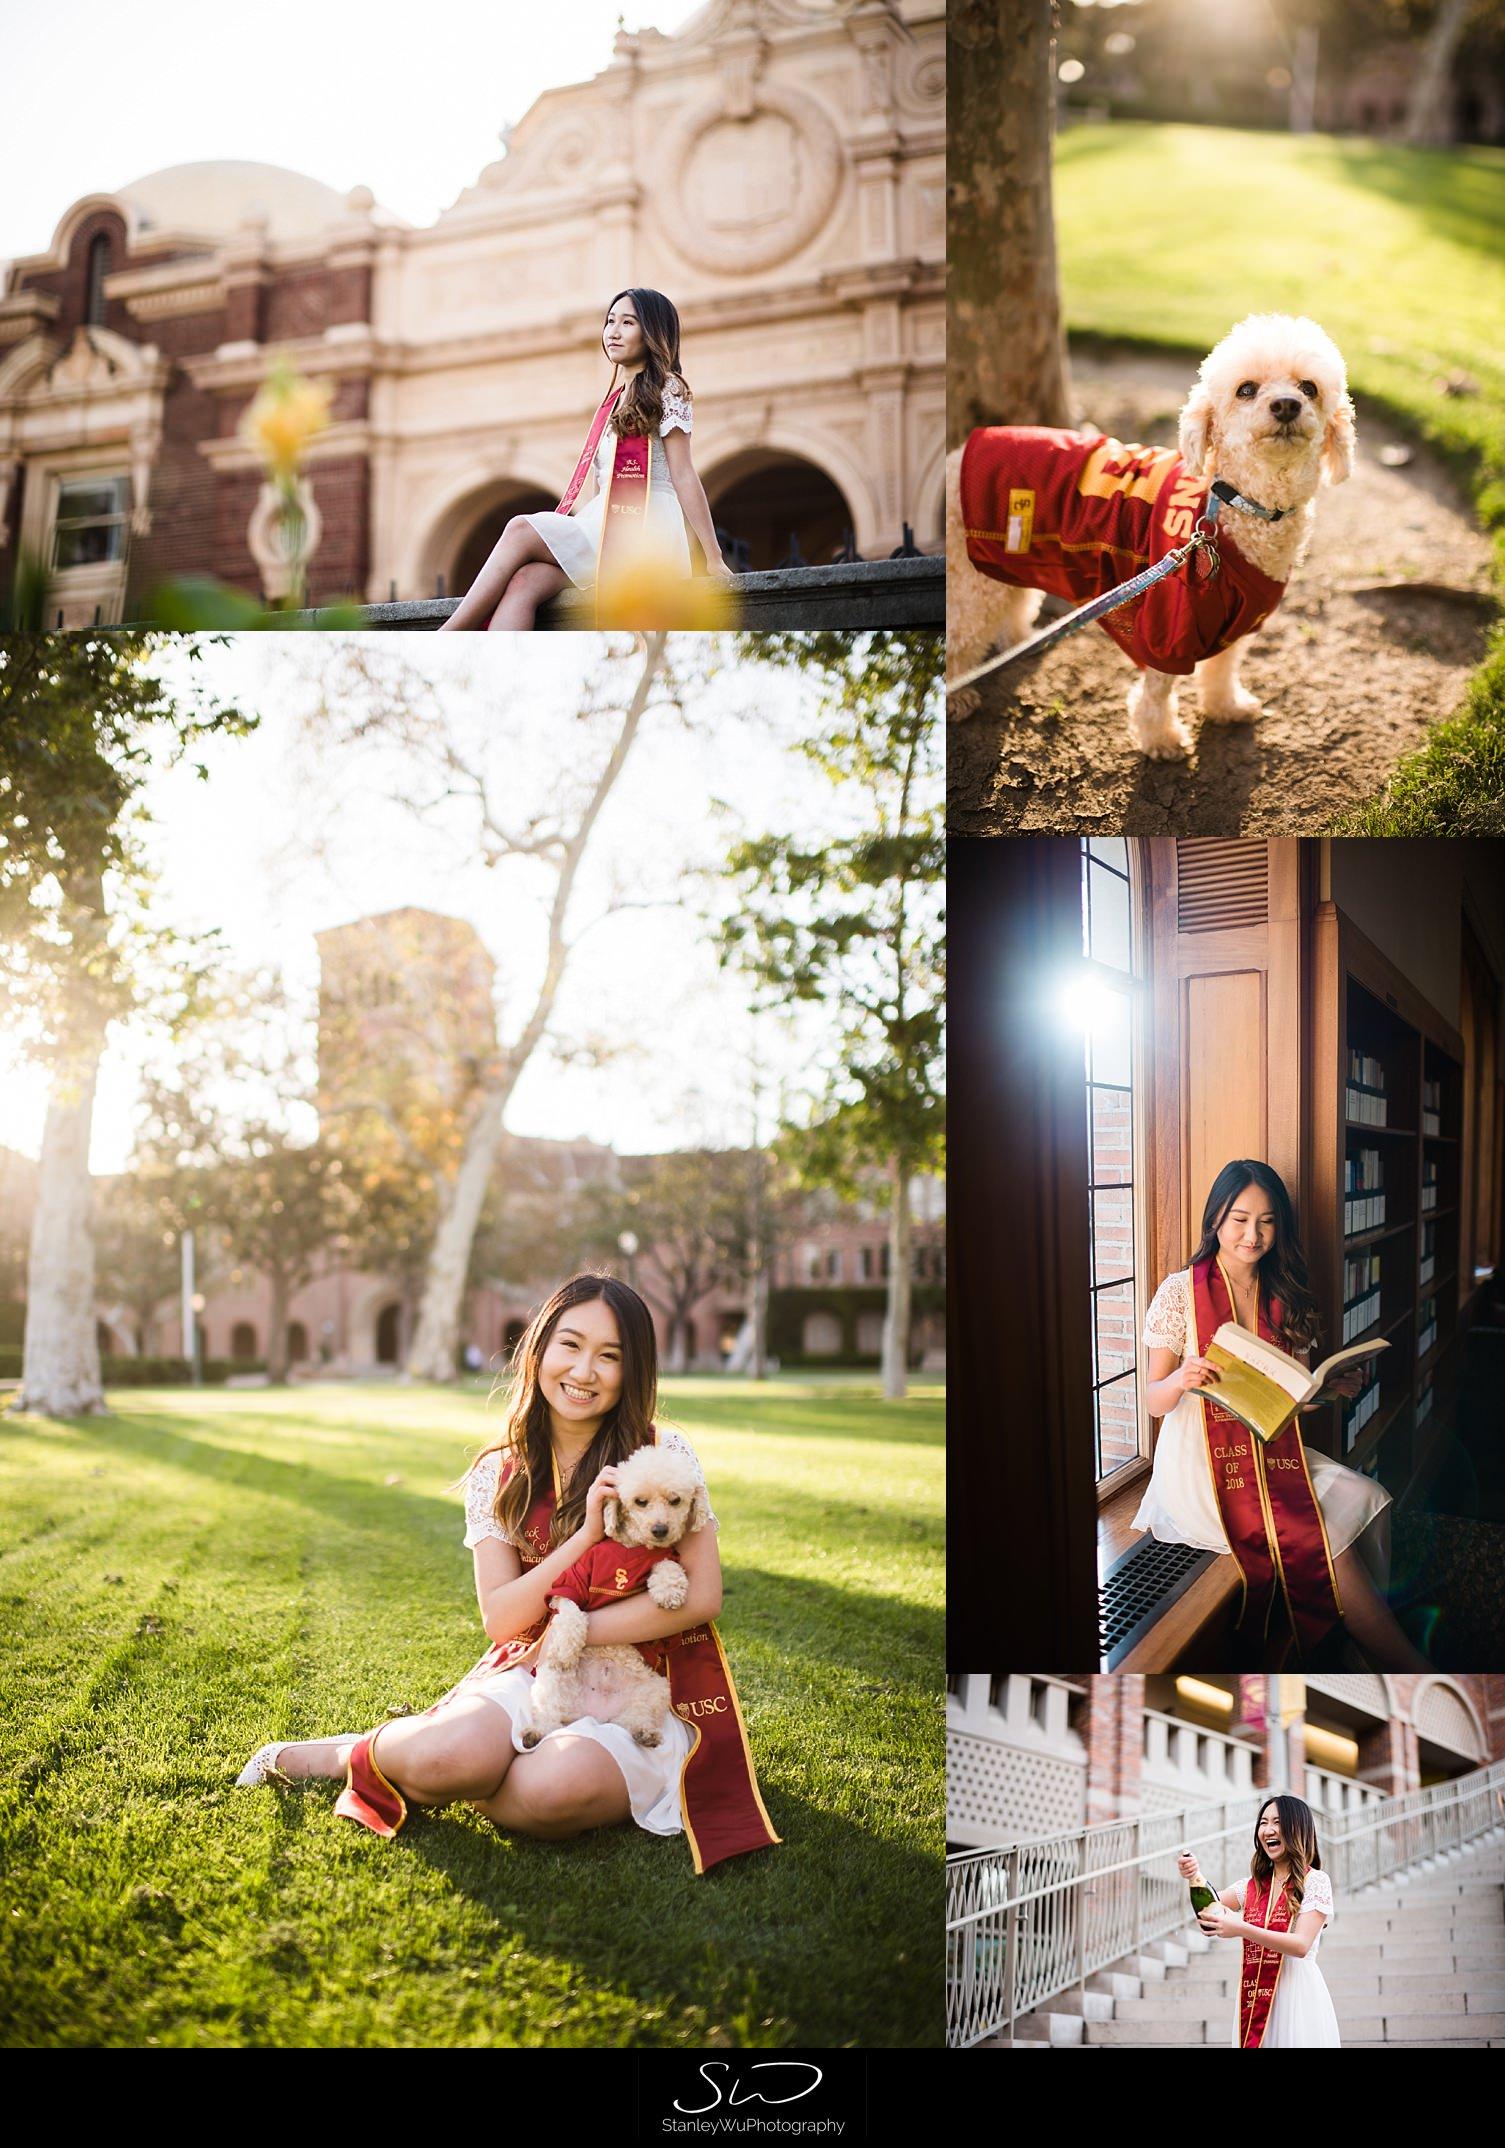 los-angeles-usc-graduation-senior-portraits_0001.jpg